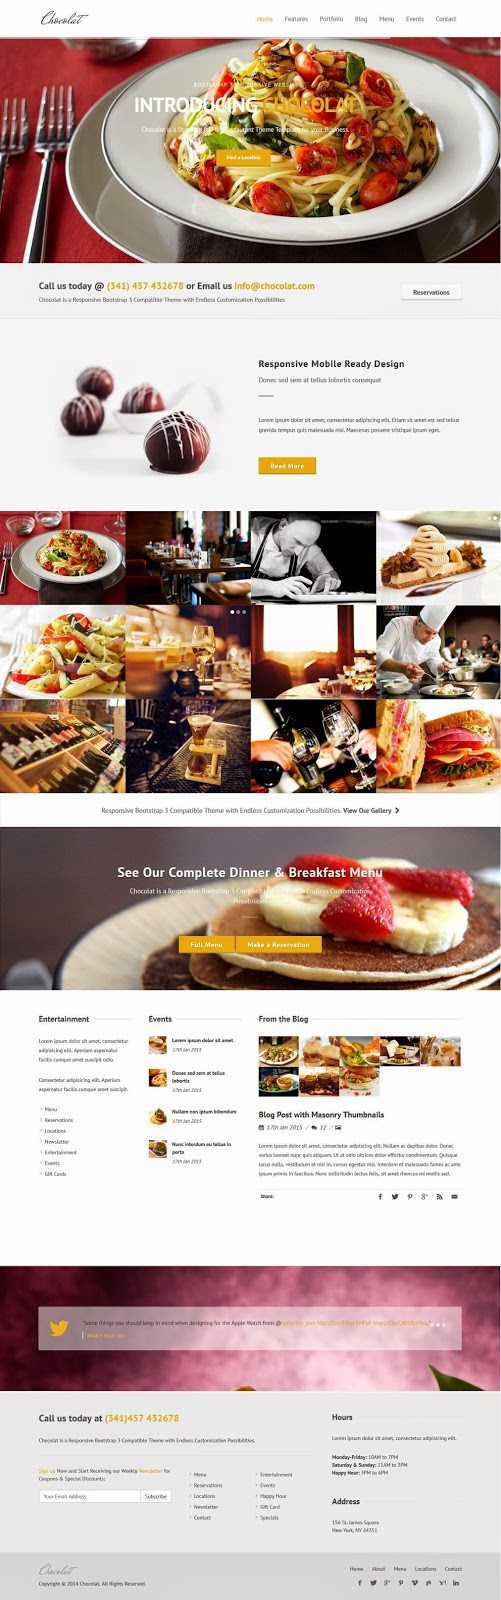 Chocolat bootstrap restaurant template 2015 web design chocolat bootstrap restaurant template 2015 maxwellsz